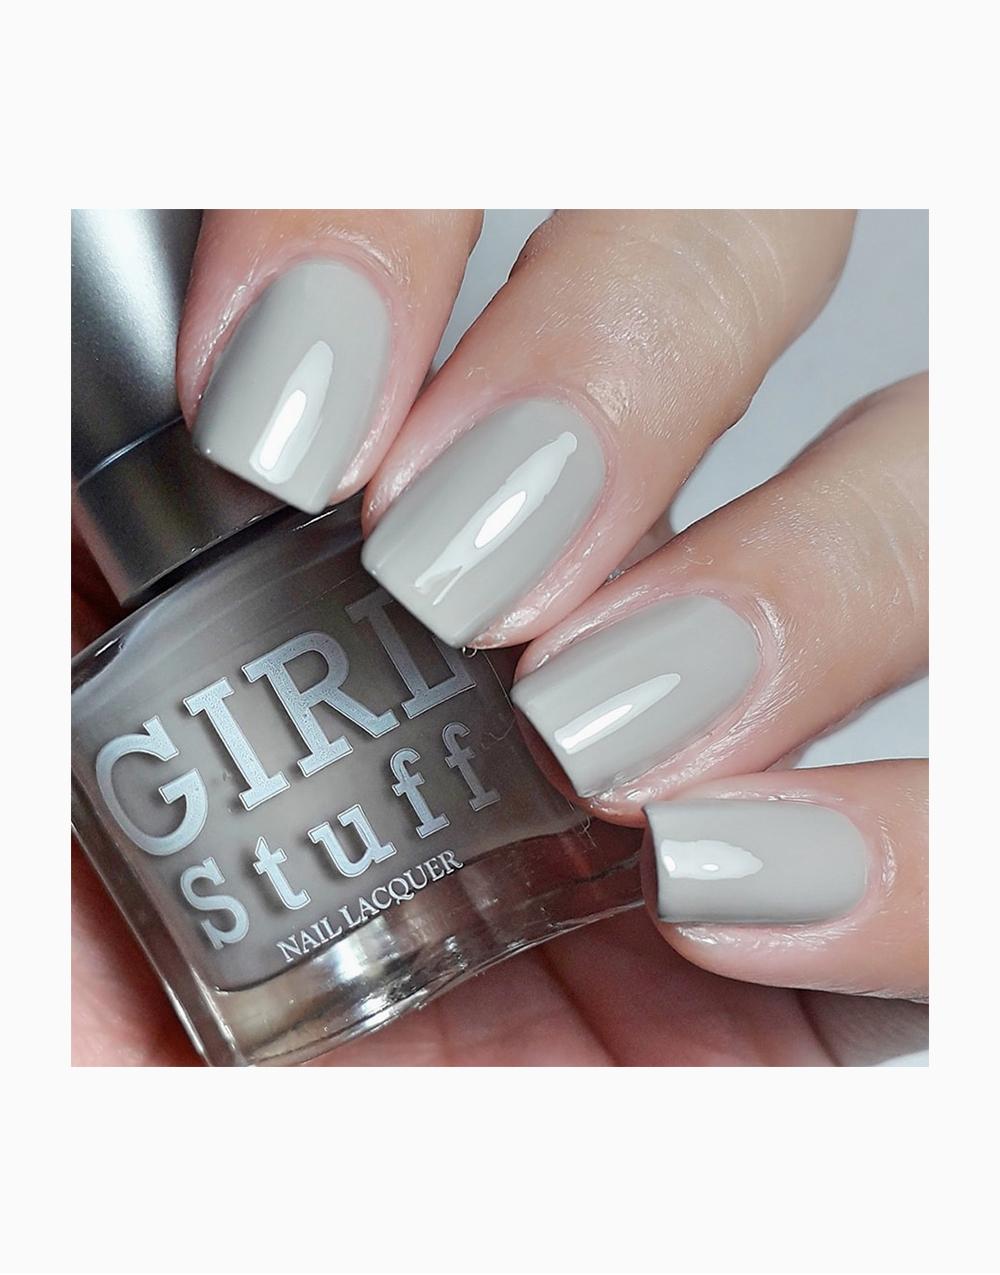 Exposed Nail Polish by Girlstuff